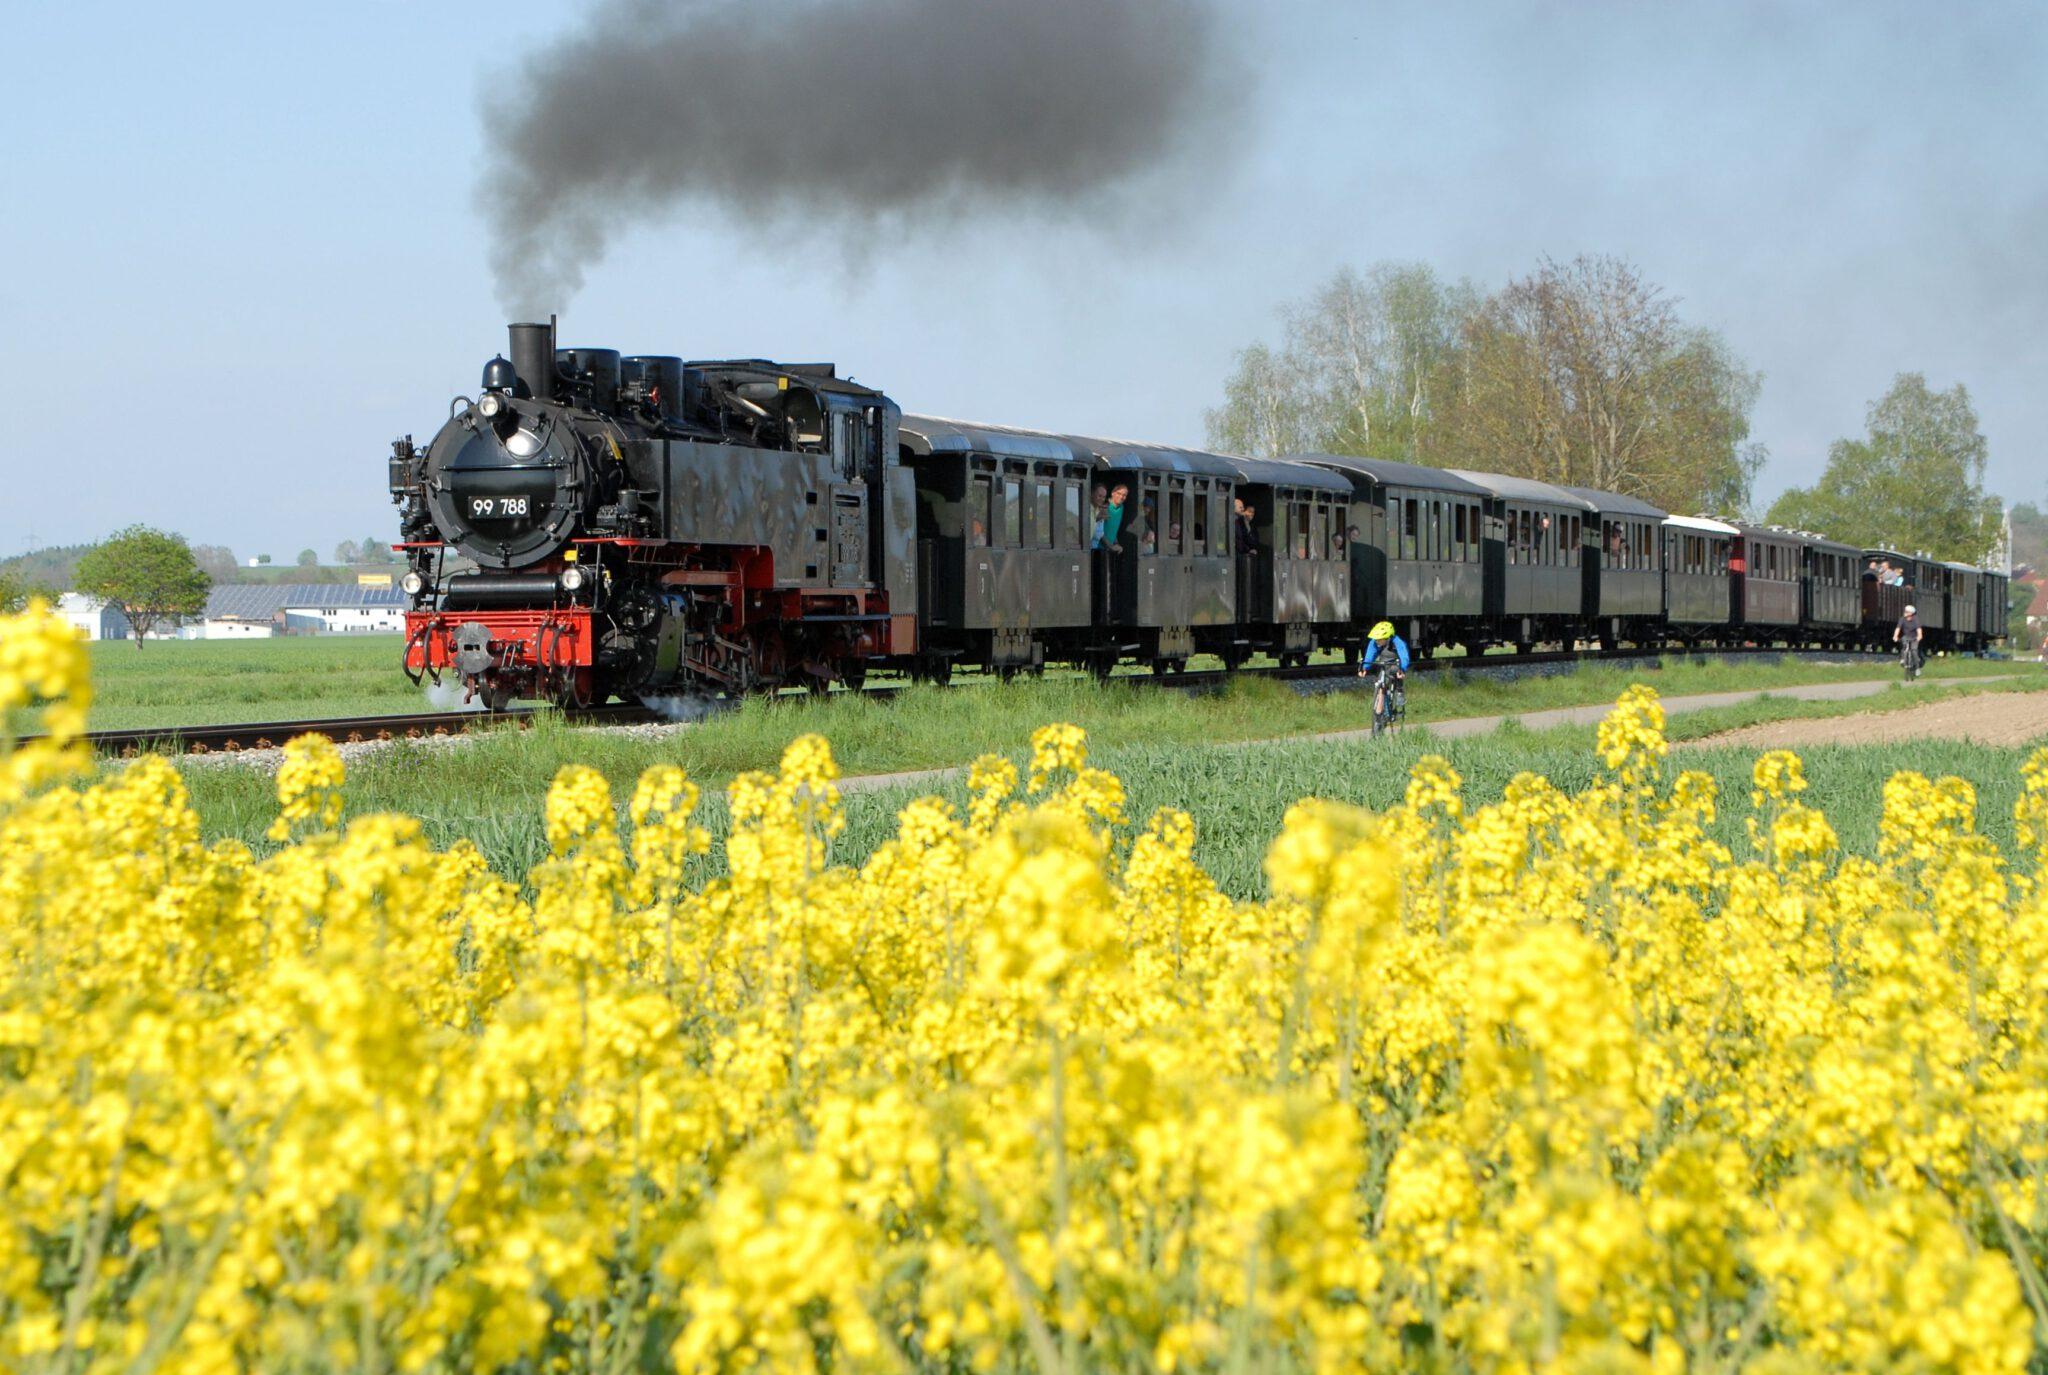 oechsle-ggg_7504b - Öchsle Museumsschmalspurbahn